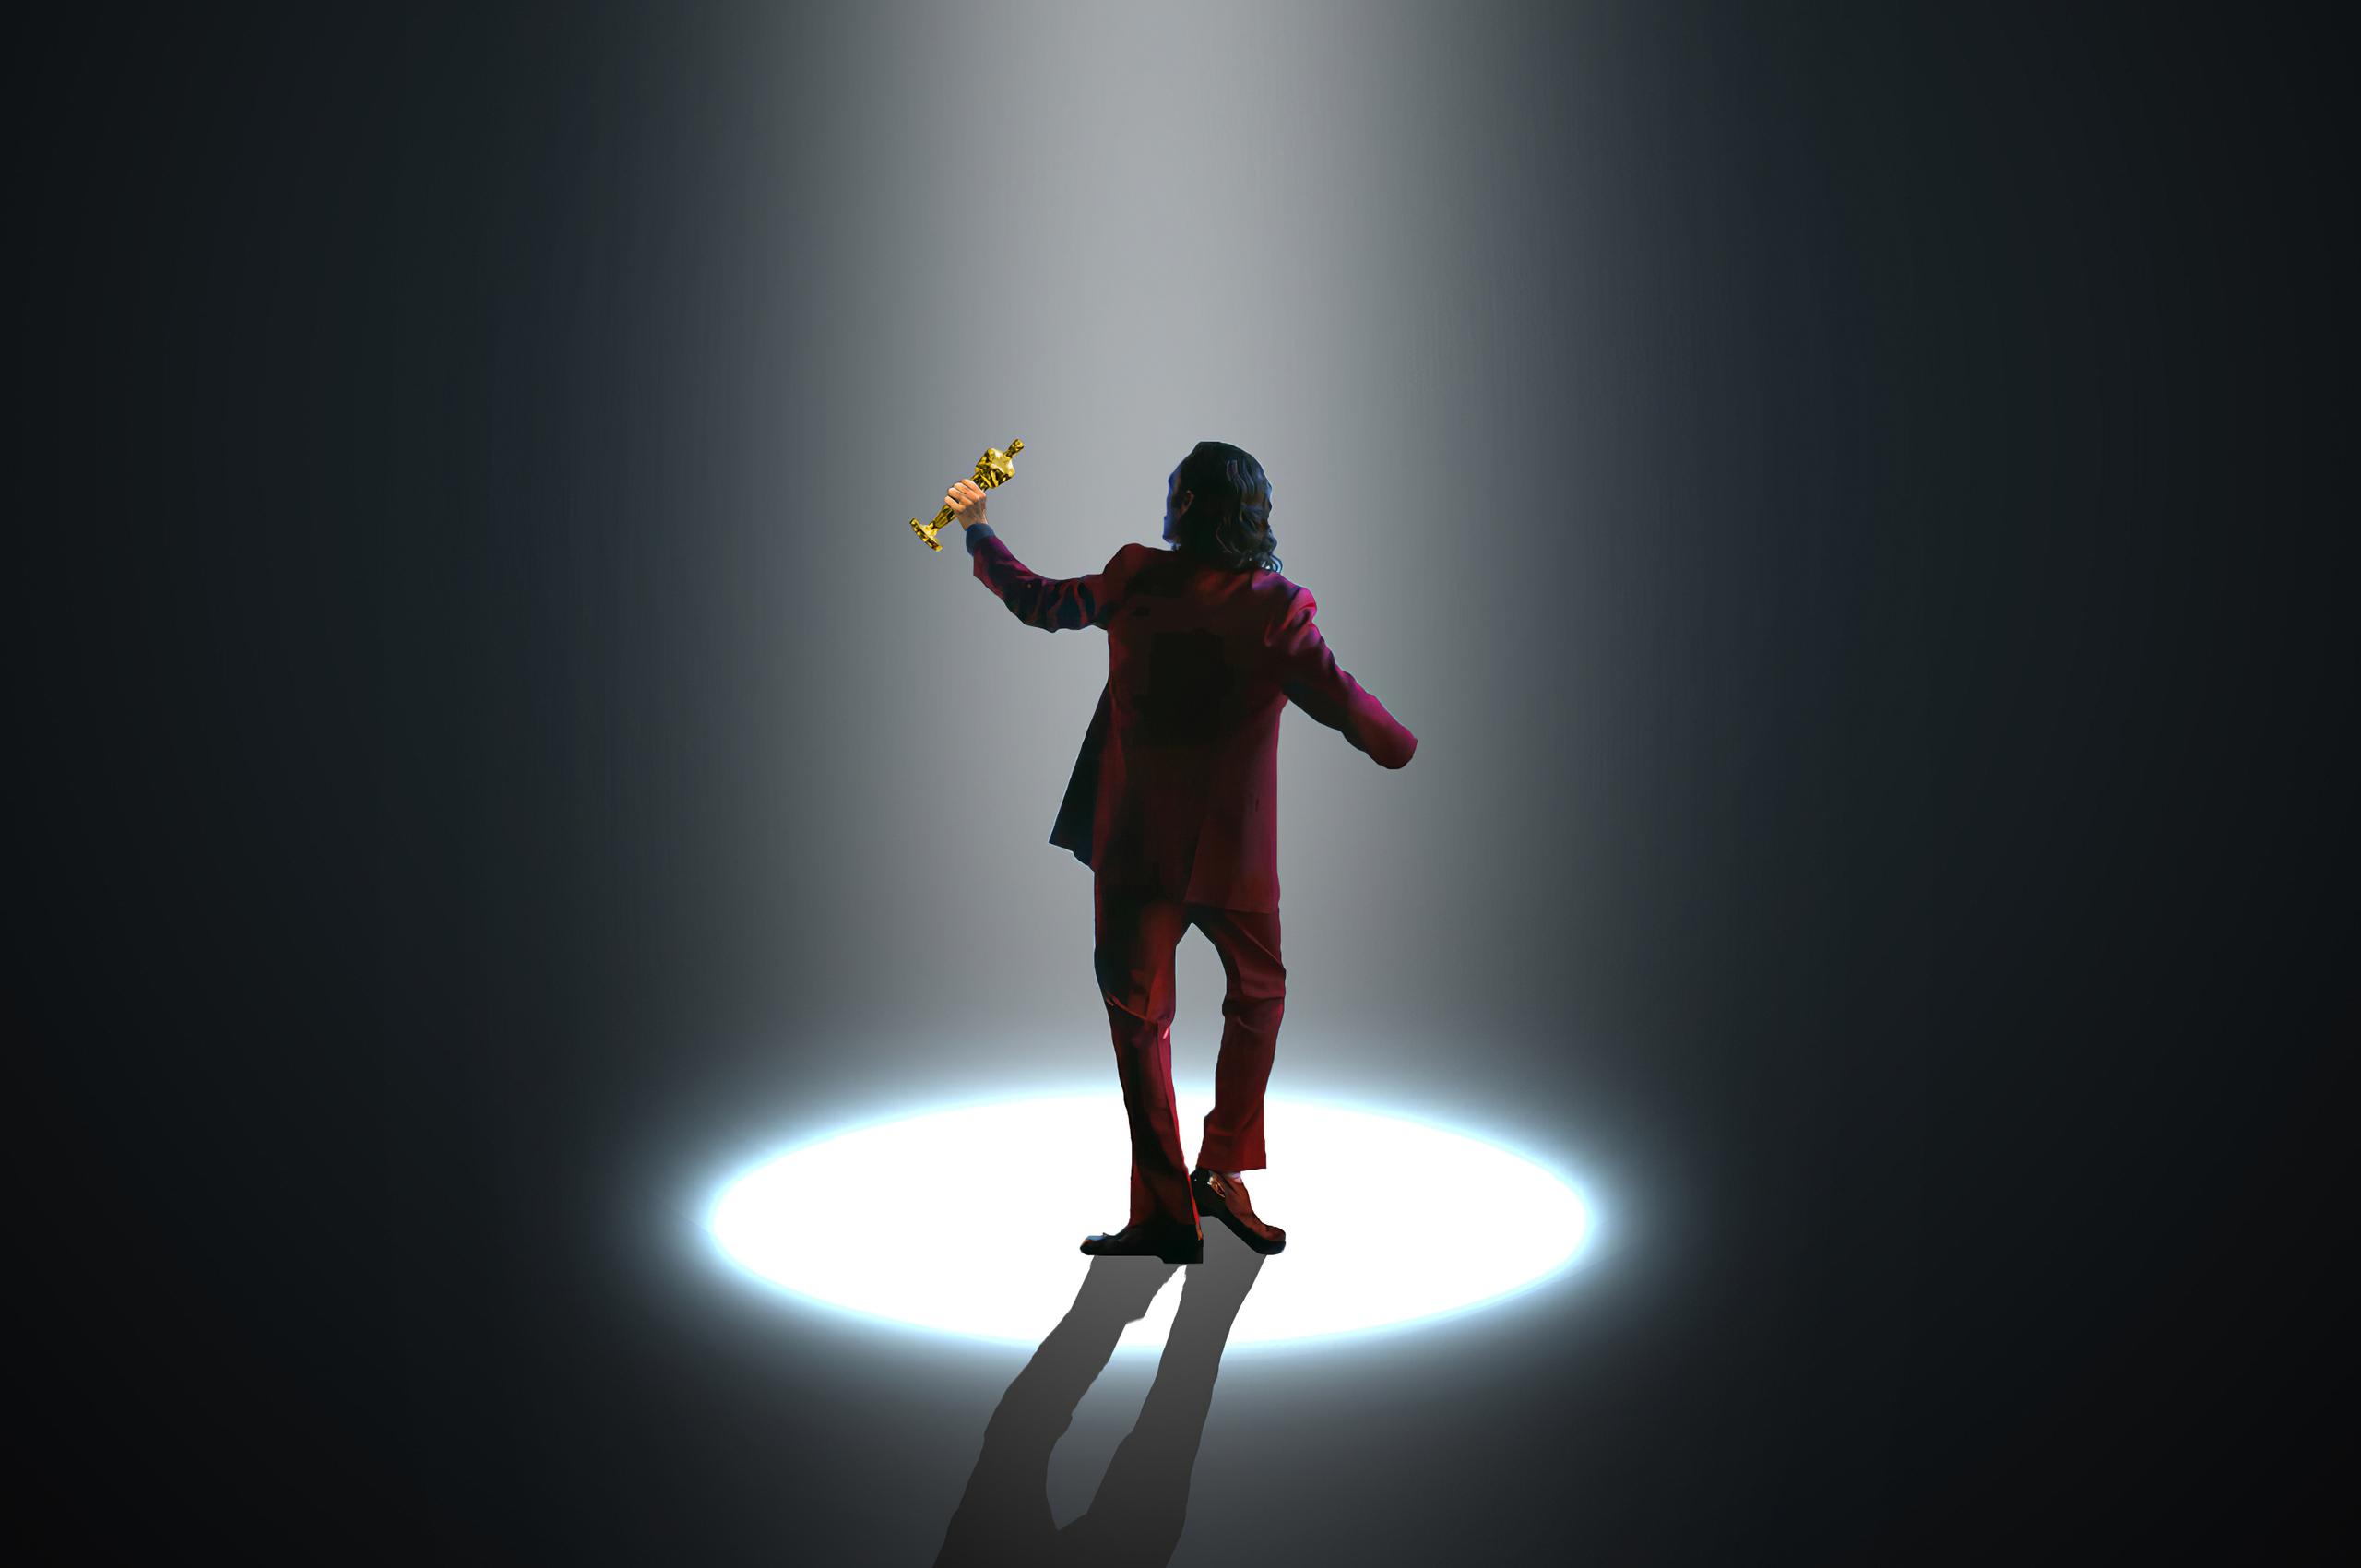 joker-dance-artwork-a7.jpg